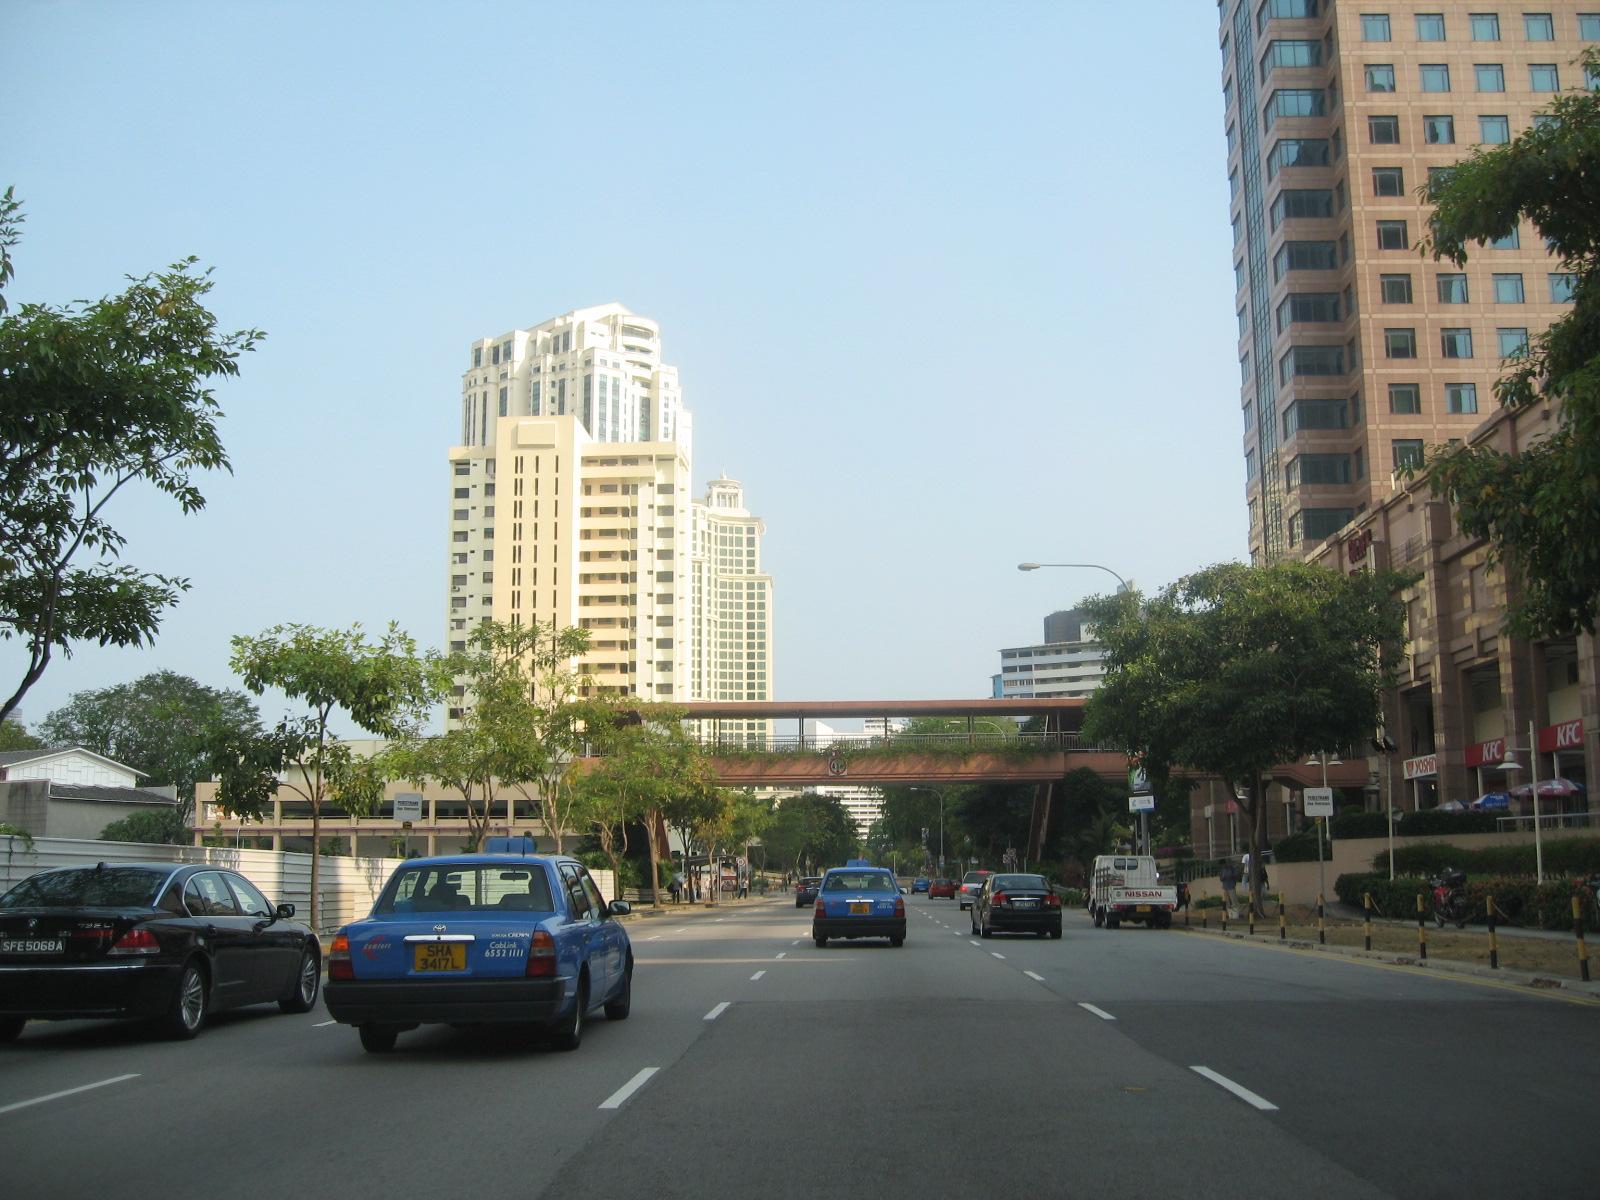 Kim Seng Road Singapore